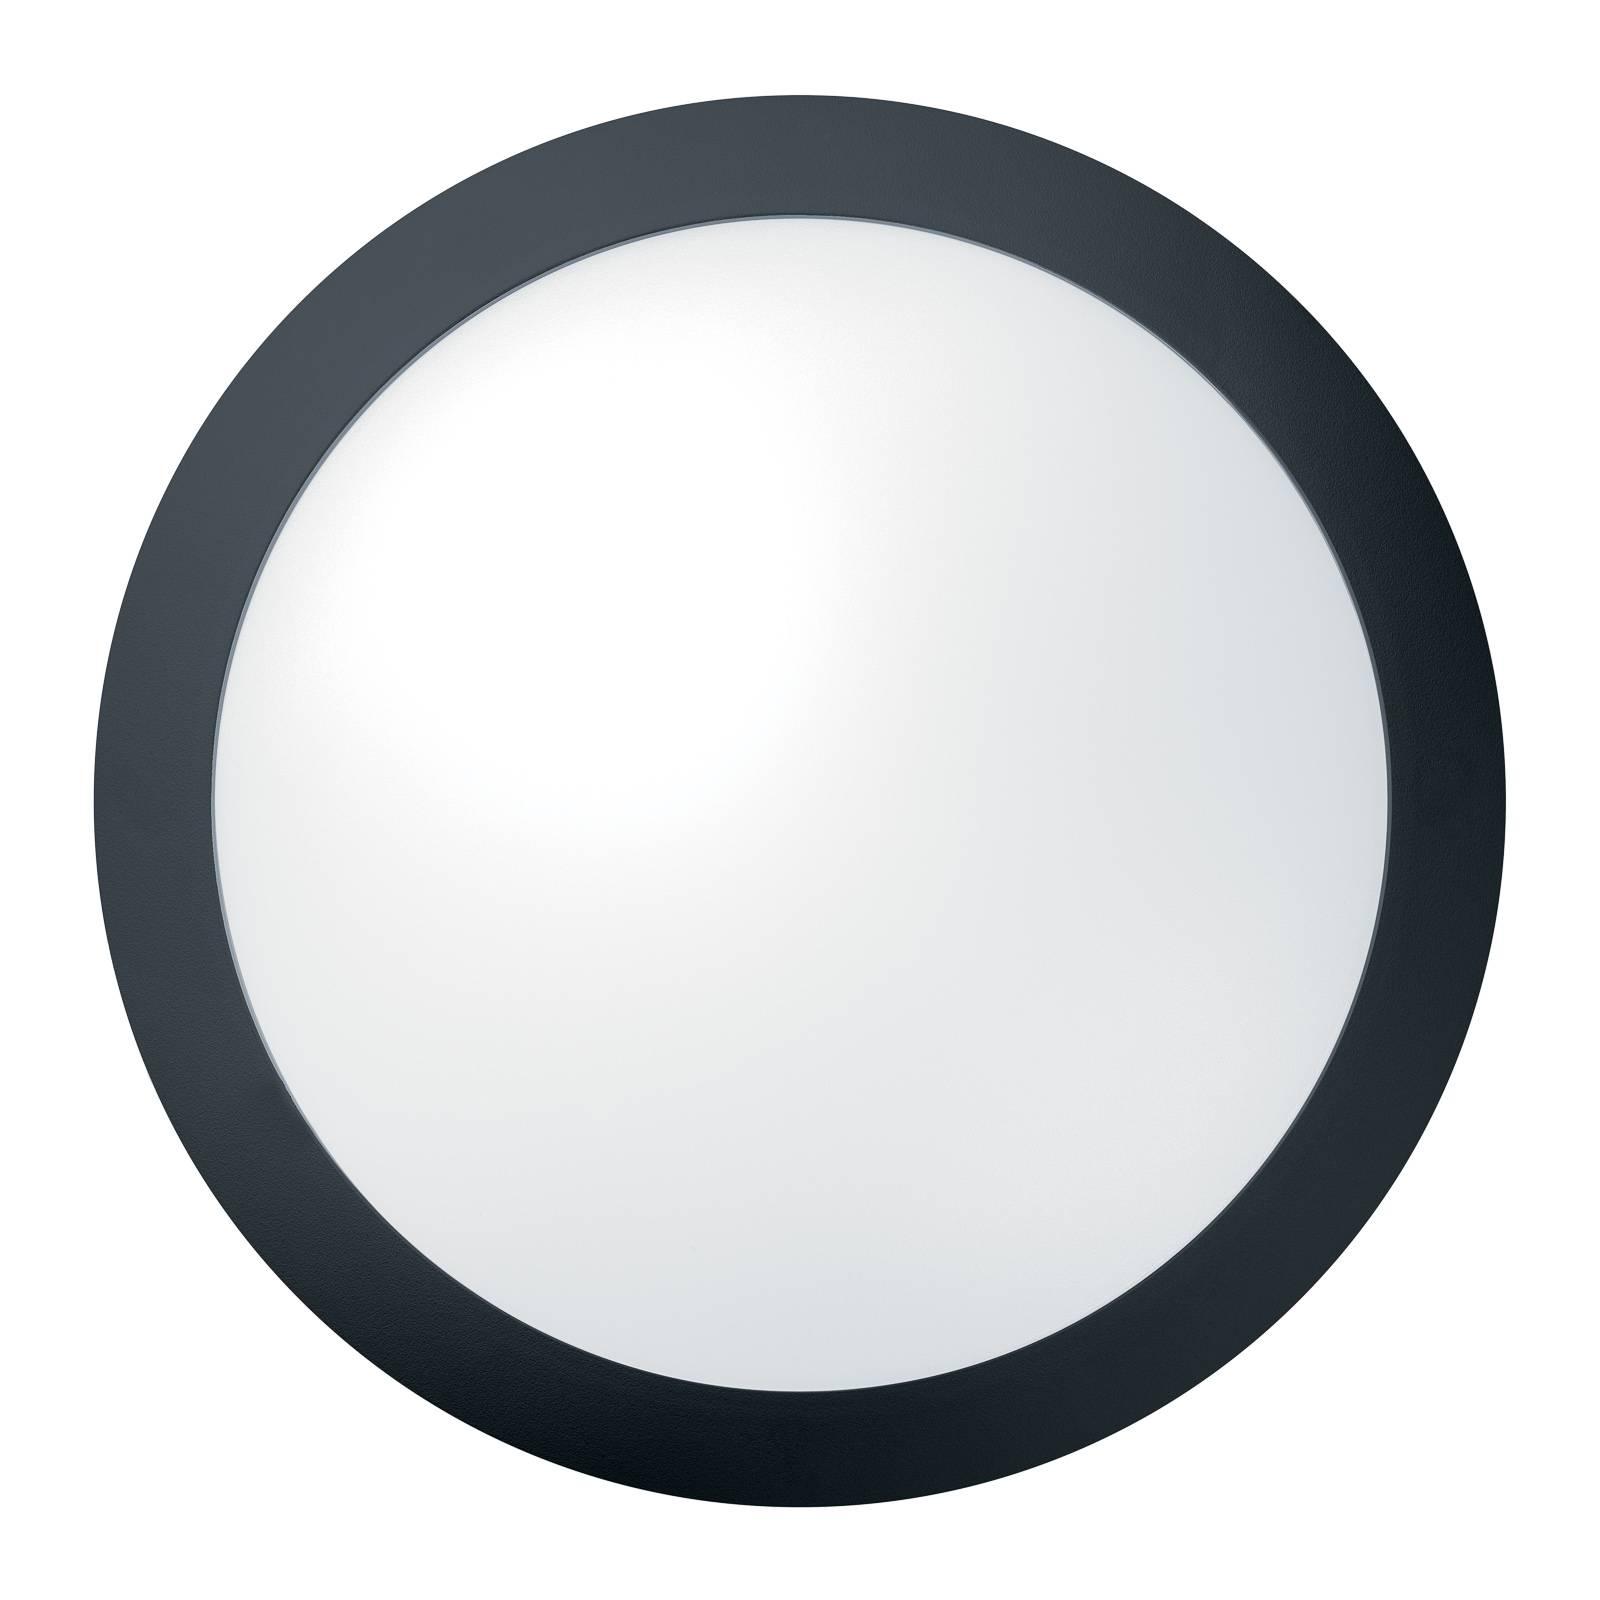 THORNeco Tom Vario Wandleuchte 14W Sensor schwarz